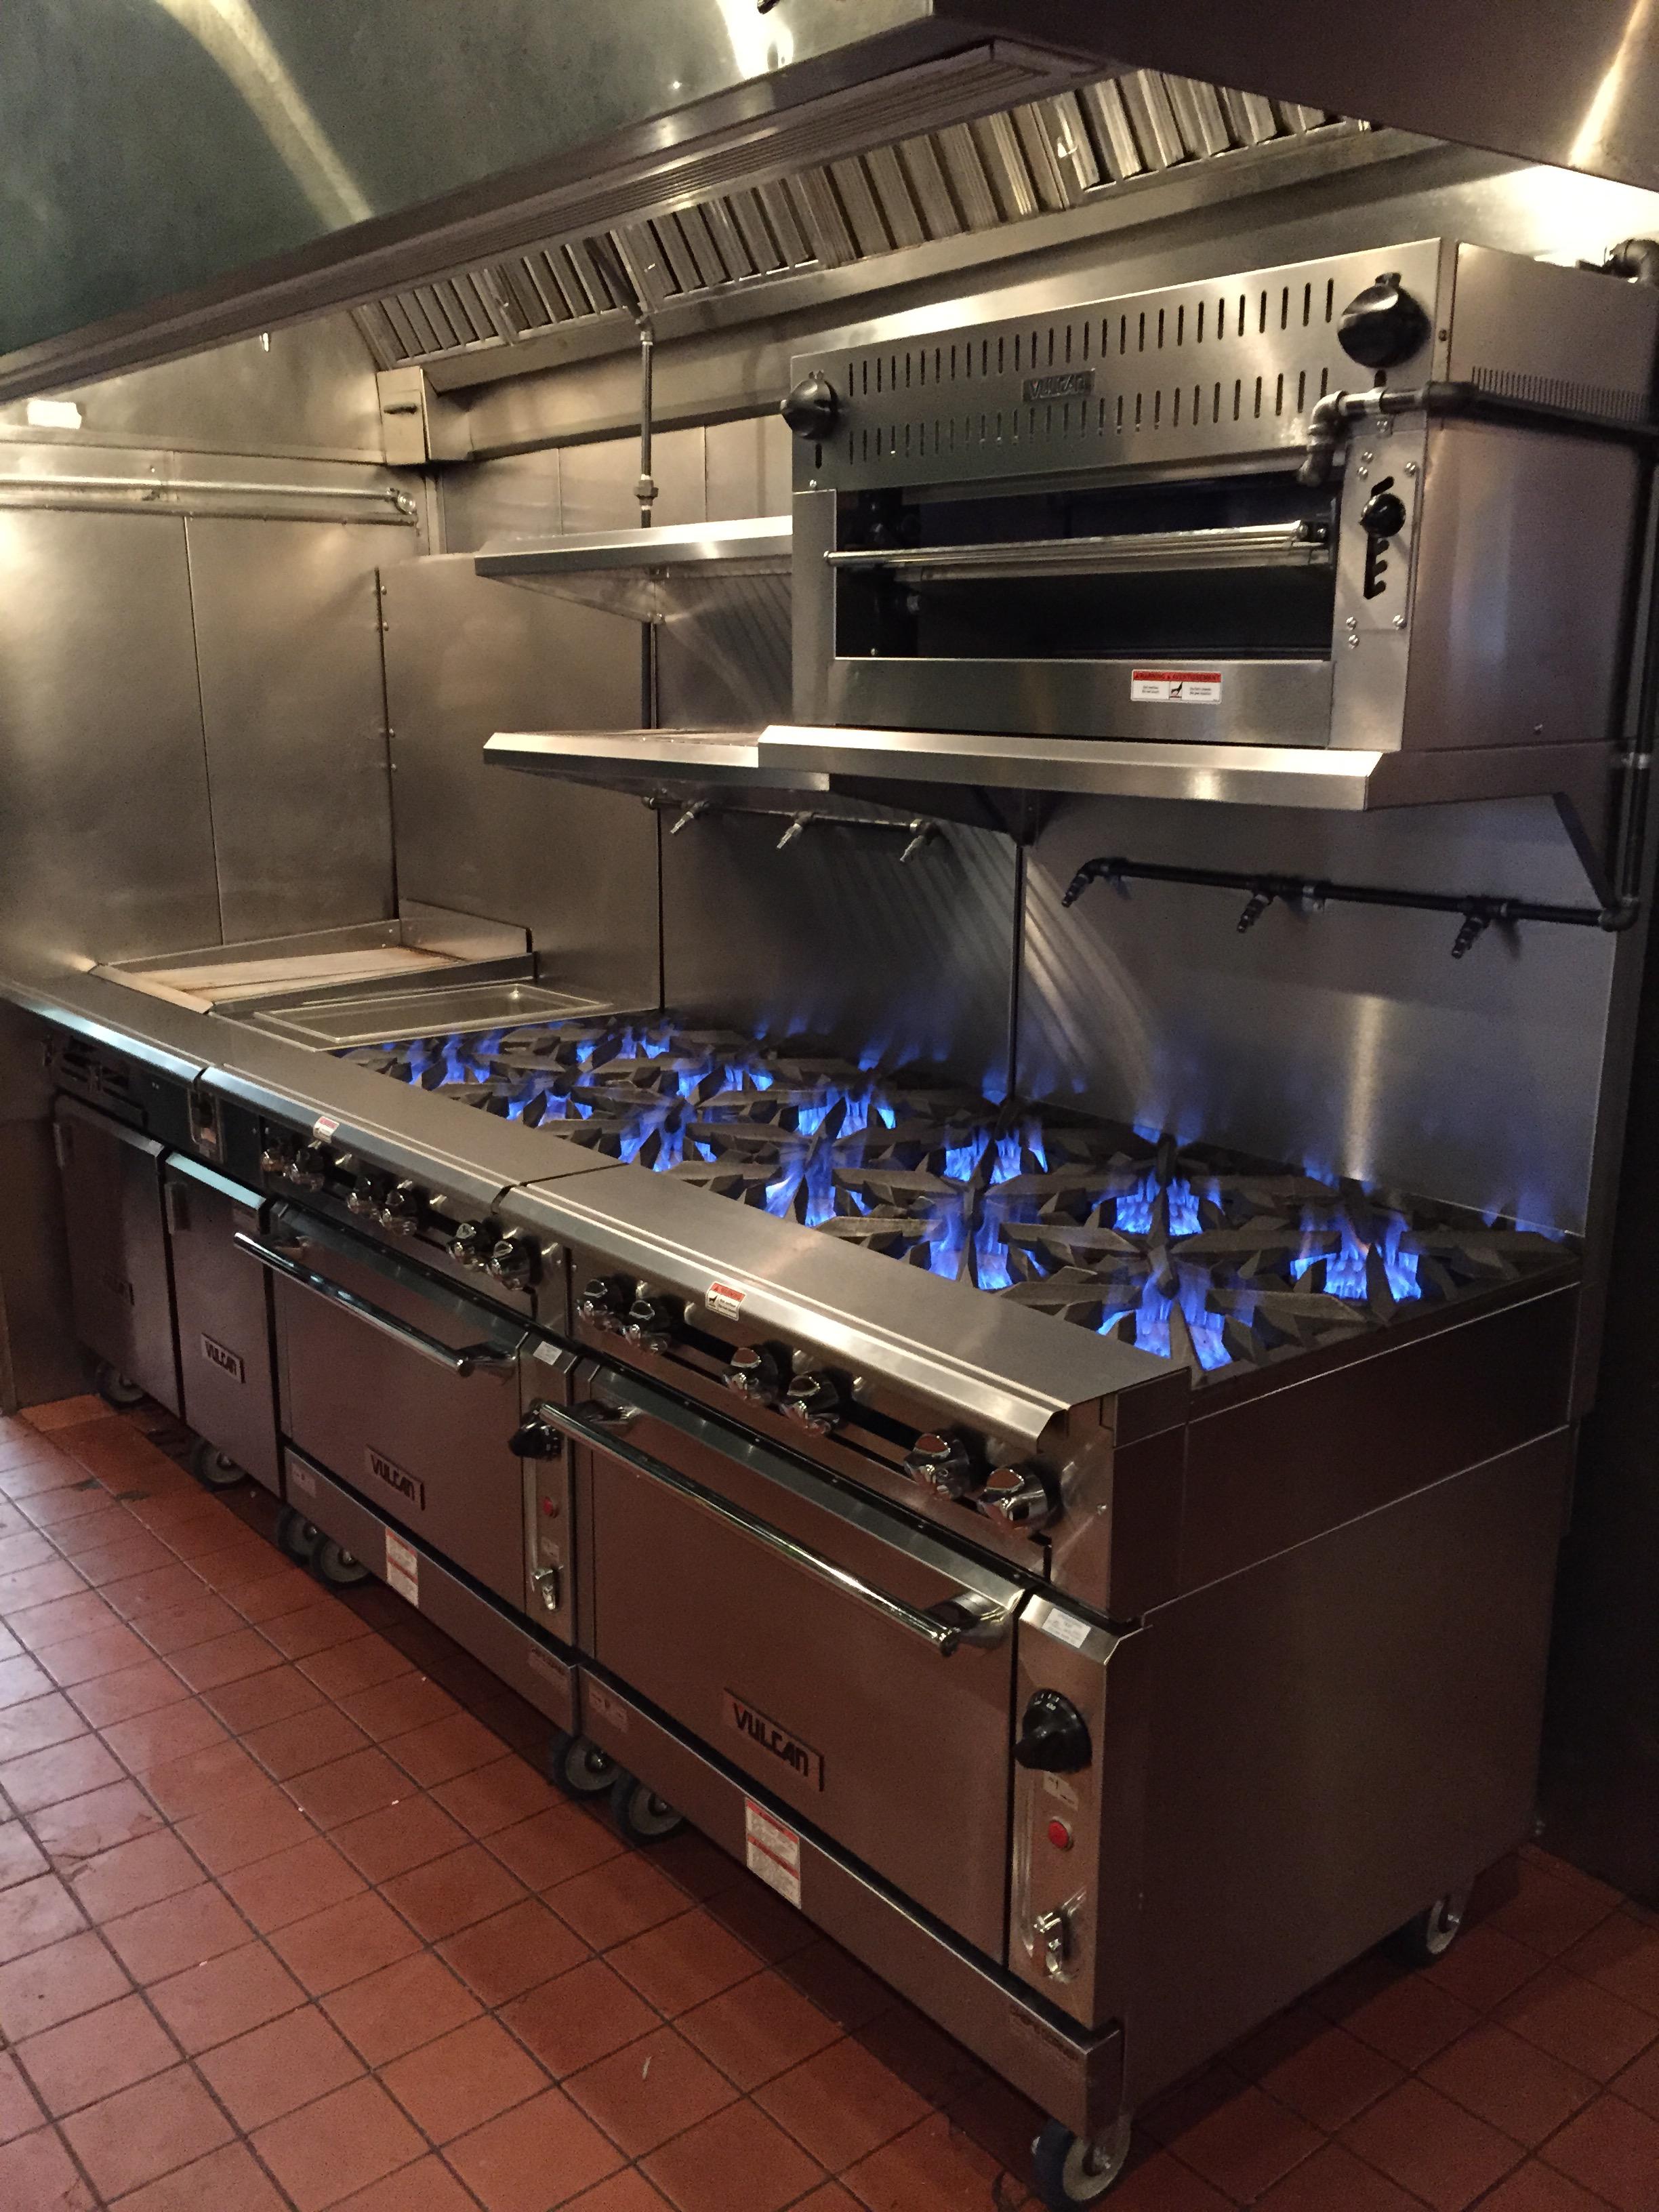 vulcan kitchen pulls main street bistro princeton nj chef s corner flanders